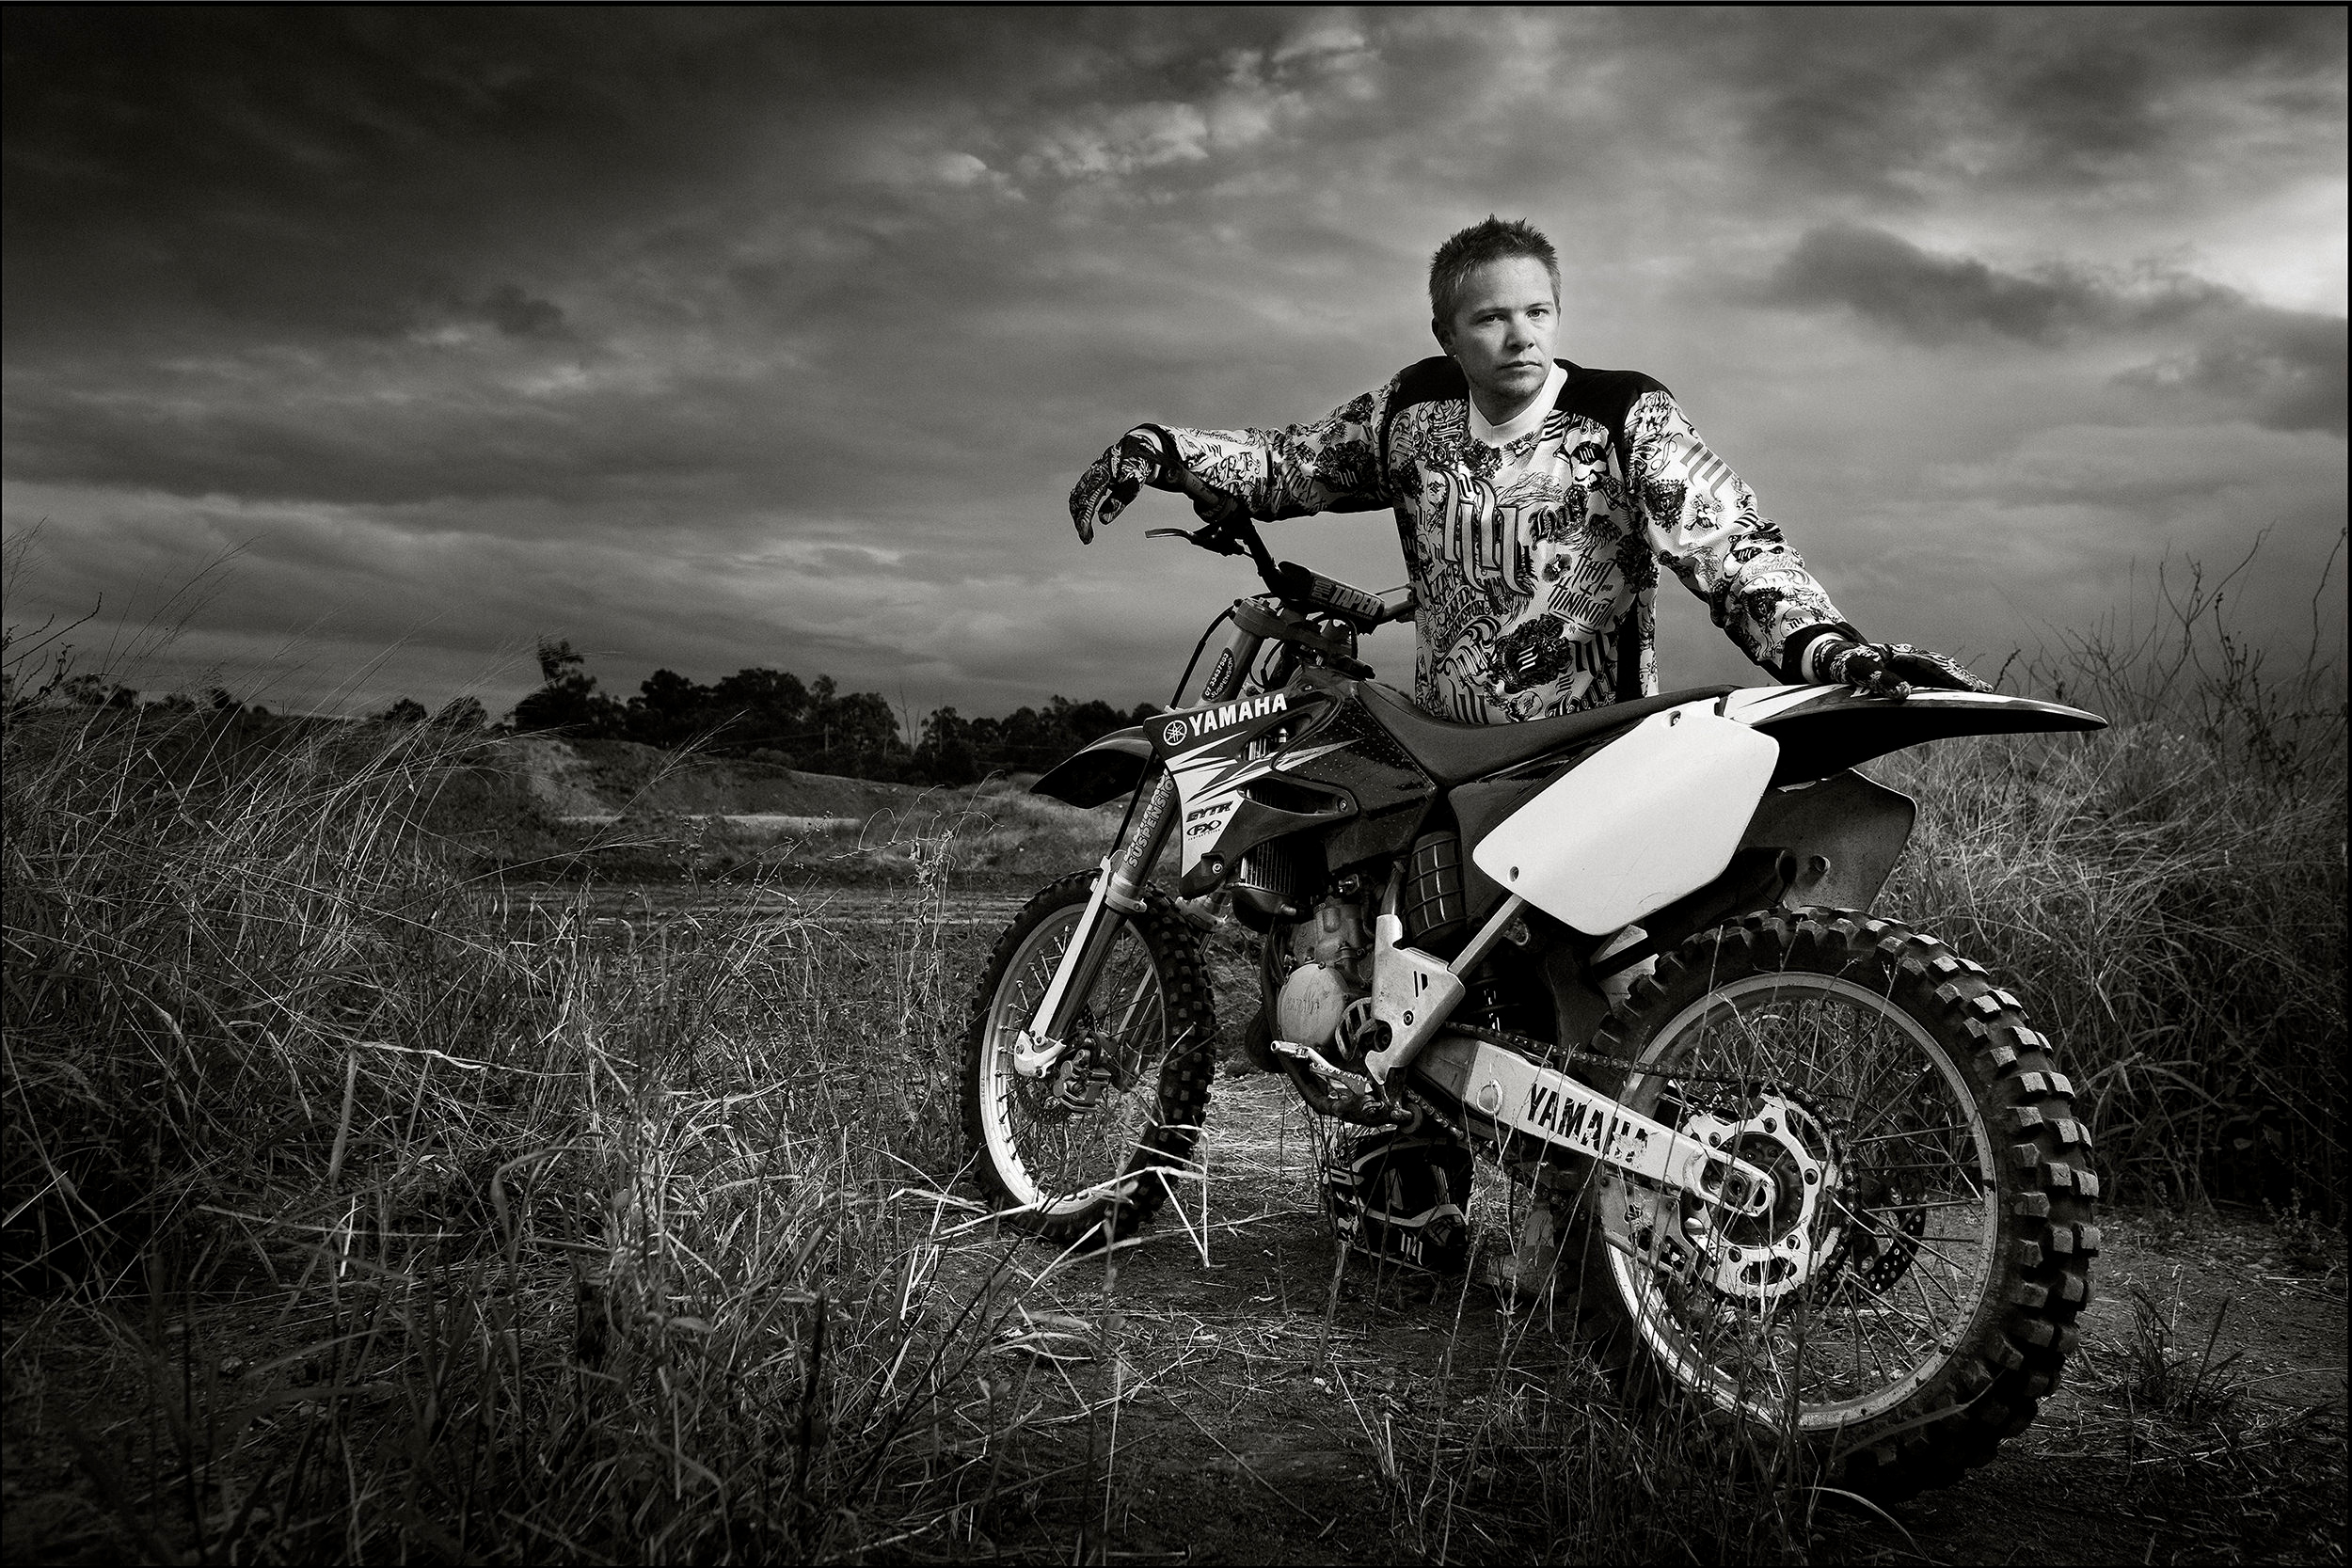 Gallery-moto-cross-portrait-black-white-portrait.jpg